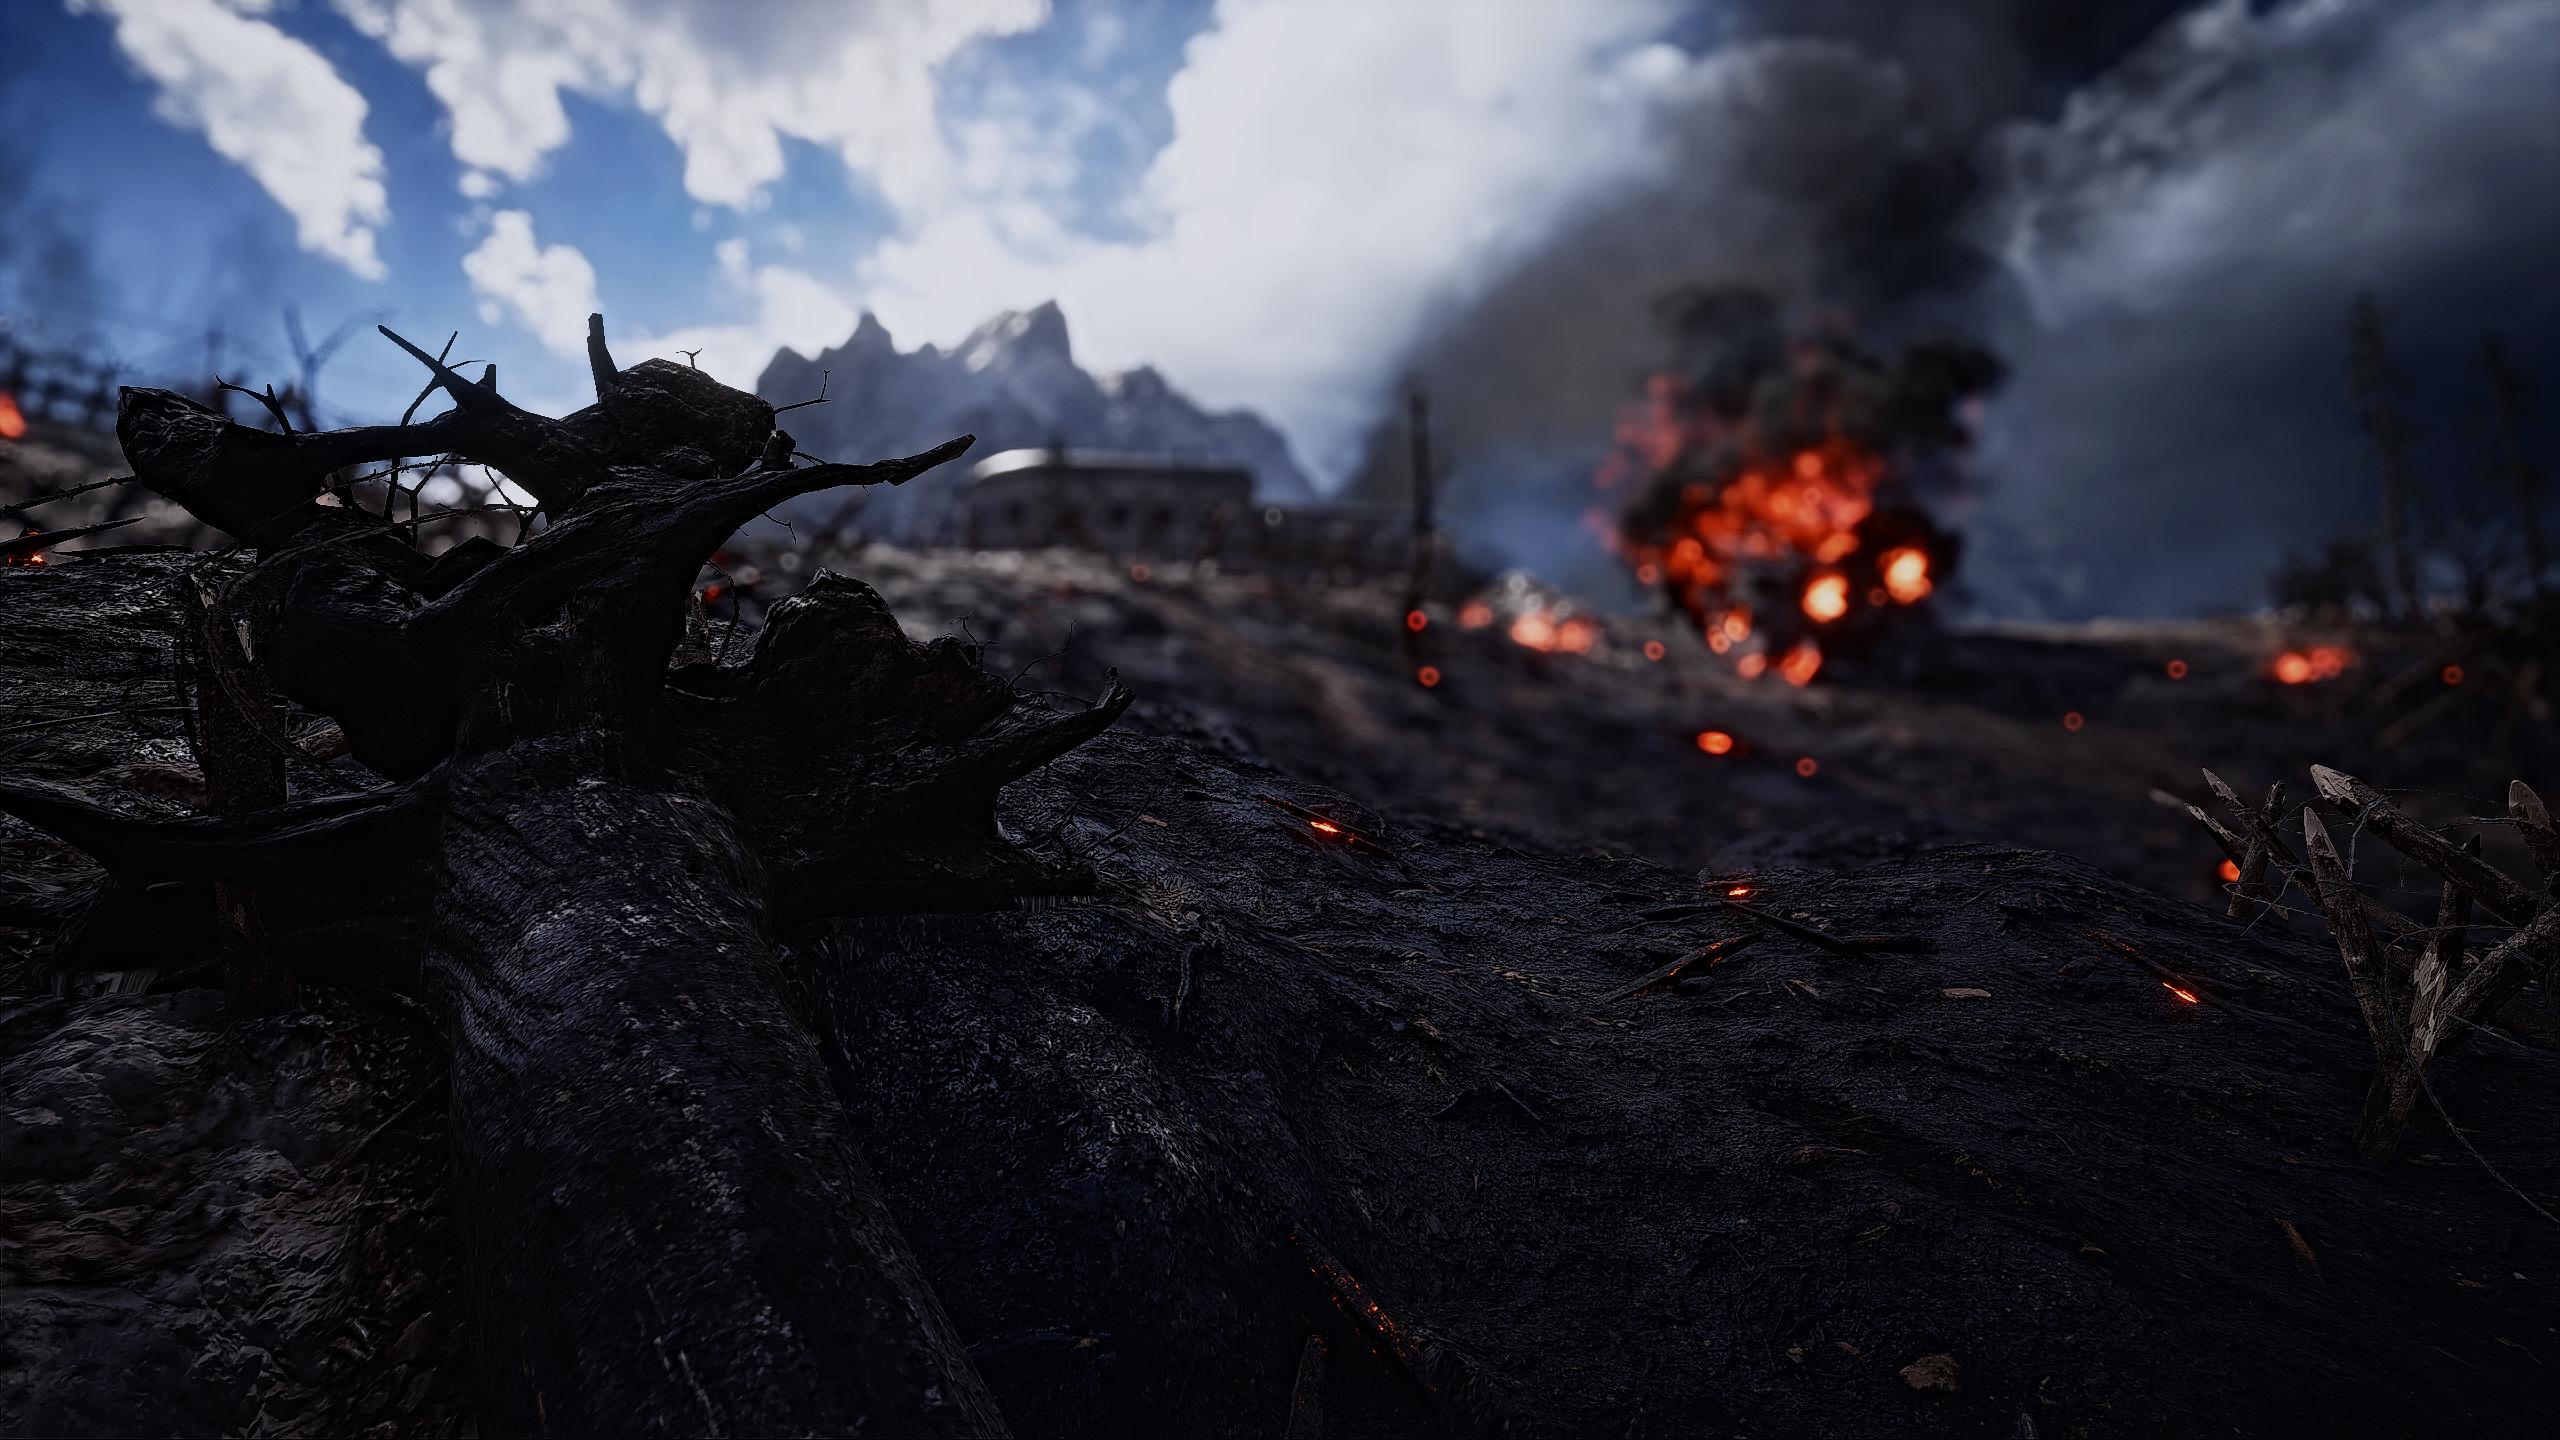 Battlefield 1 Hd Wallpaper Hintergrund 2560x1440 Id